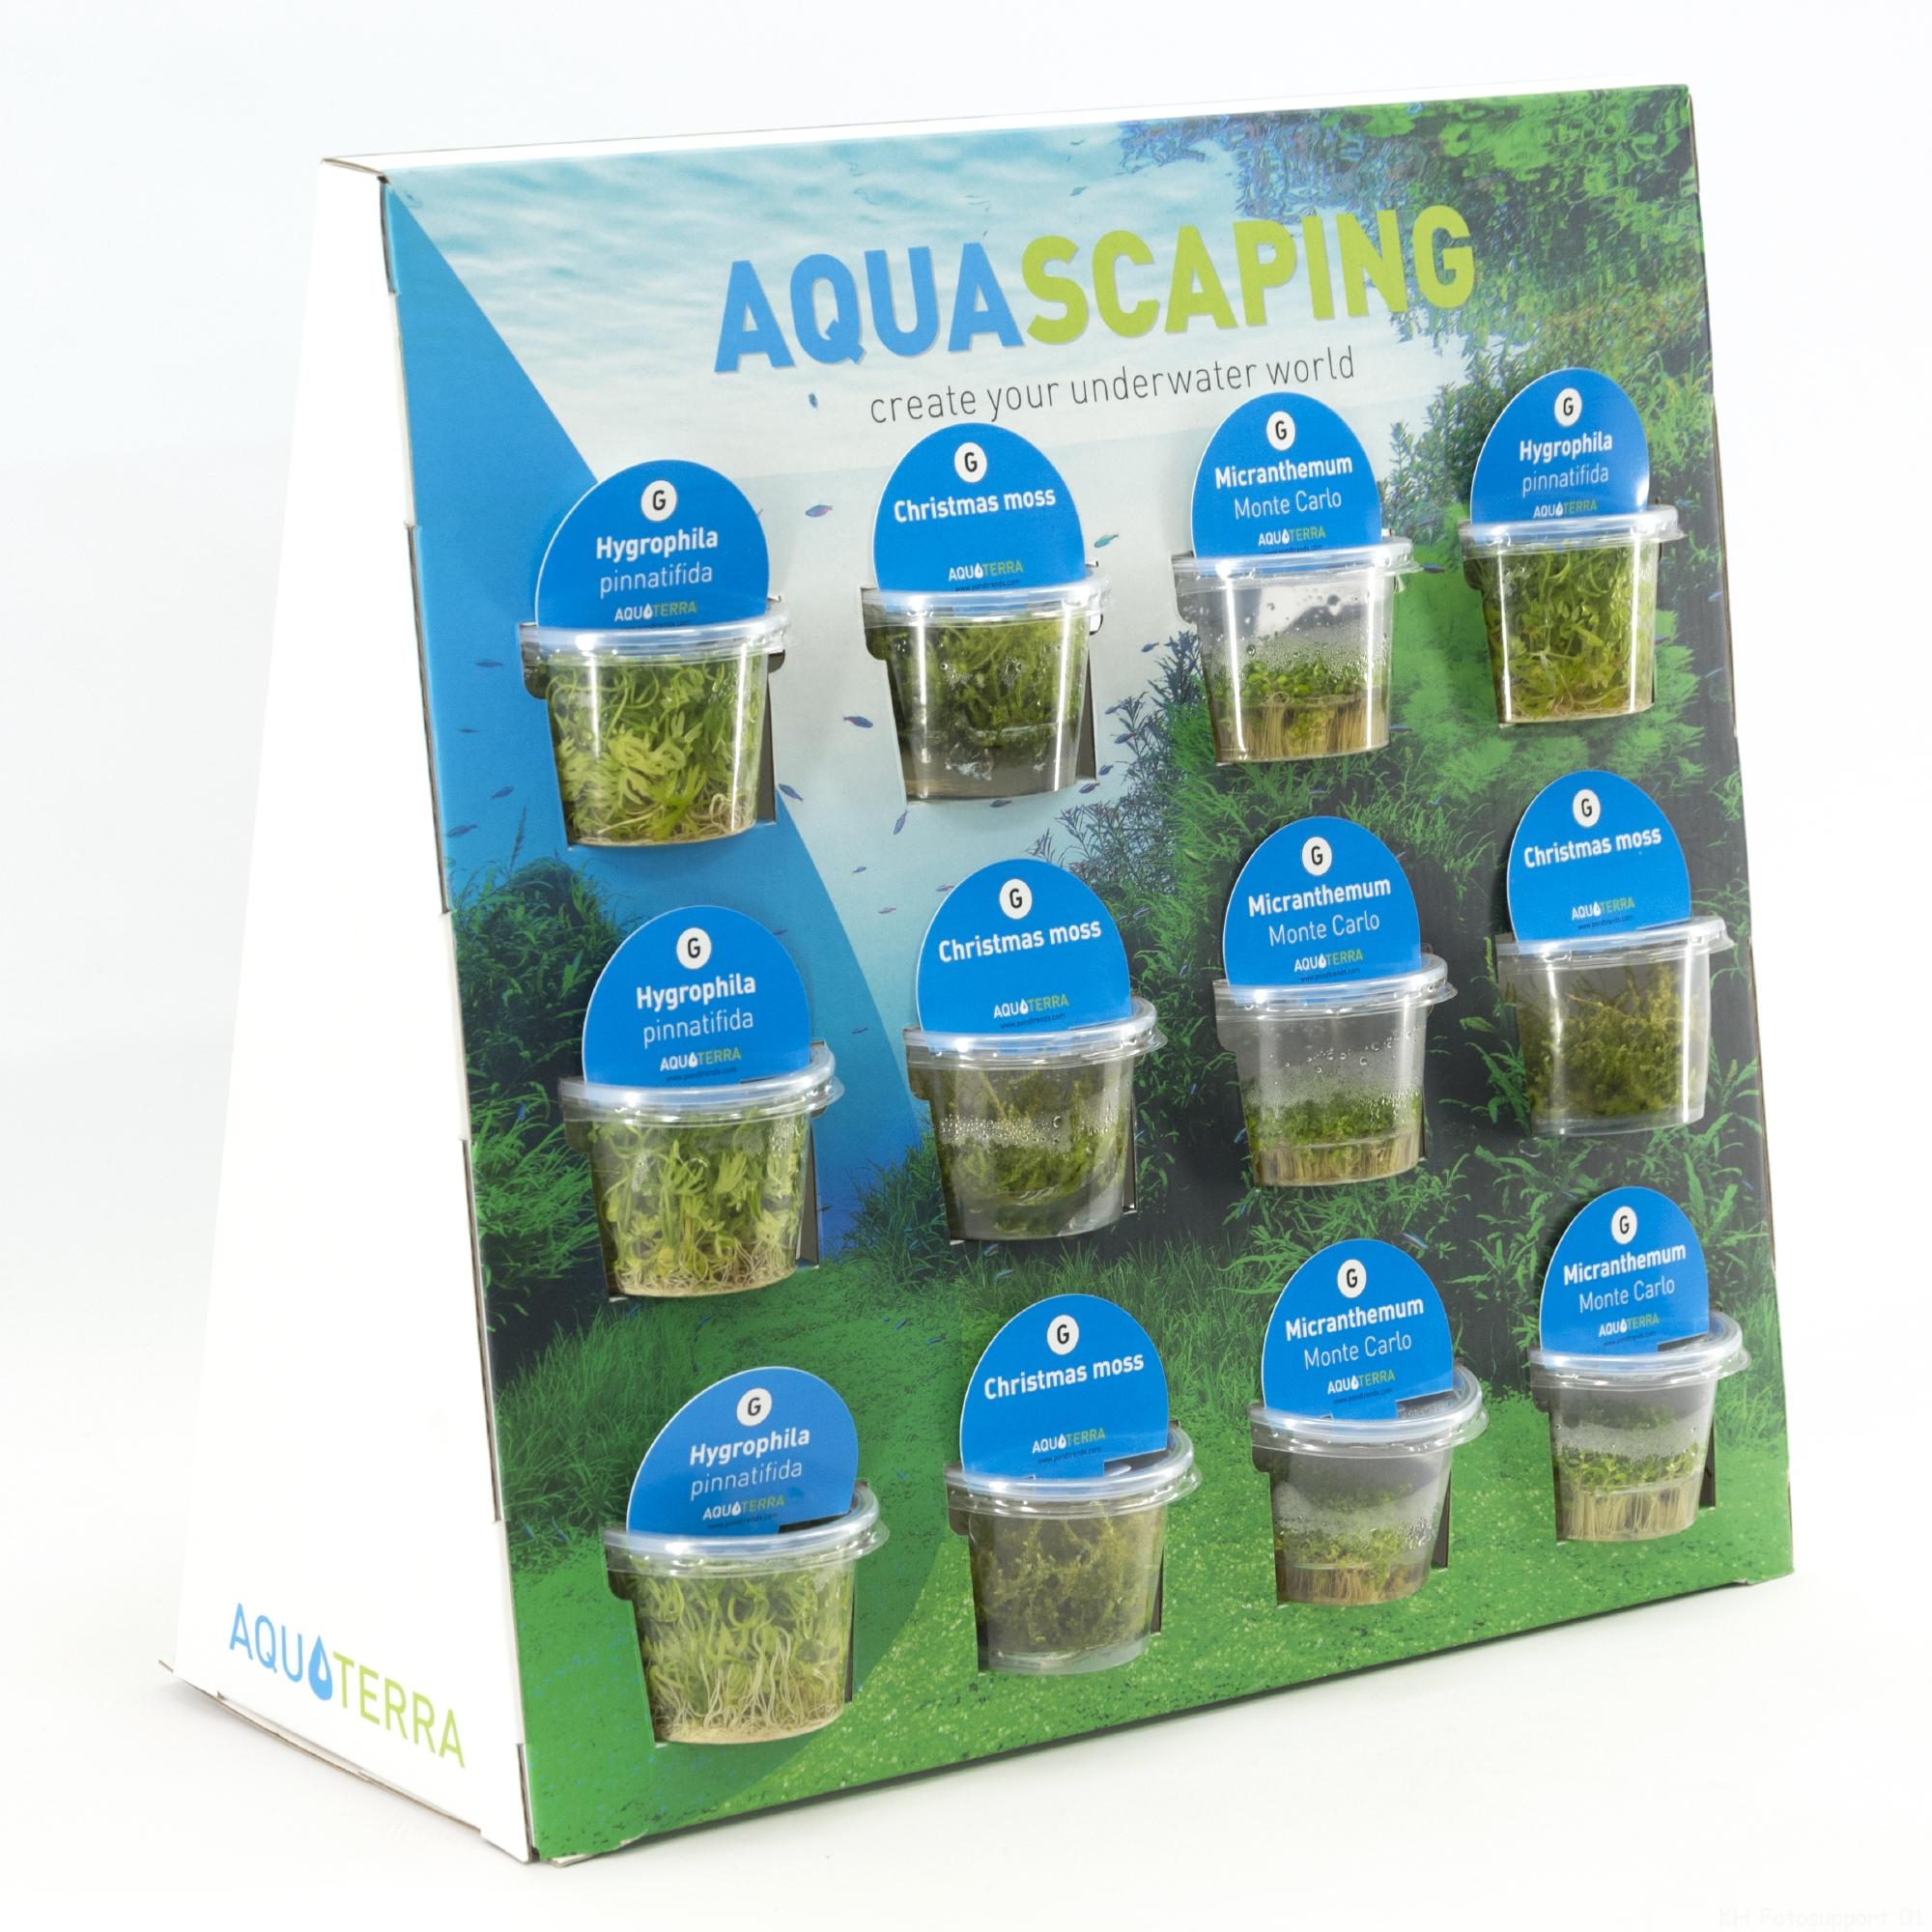 Aquascaping Display 20180320115600